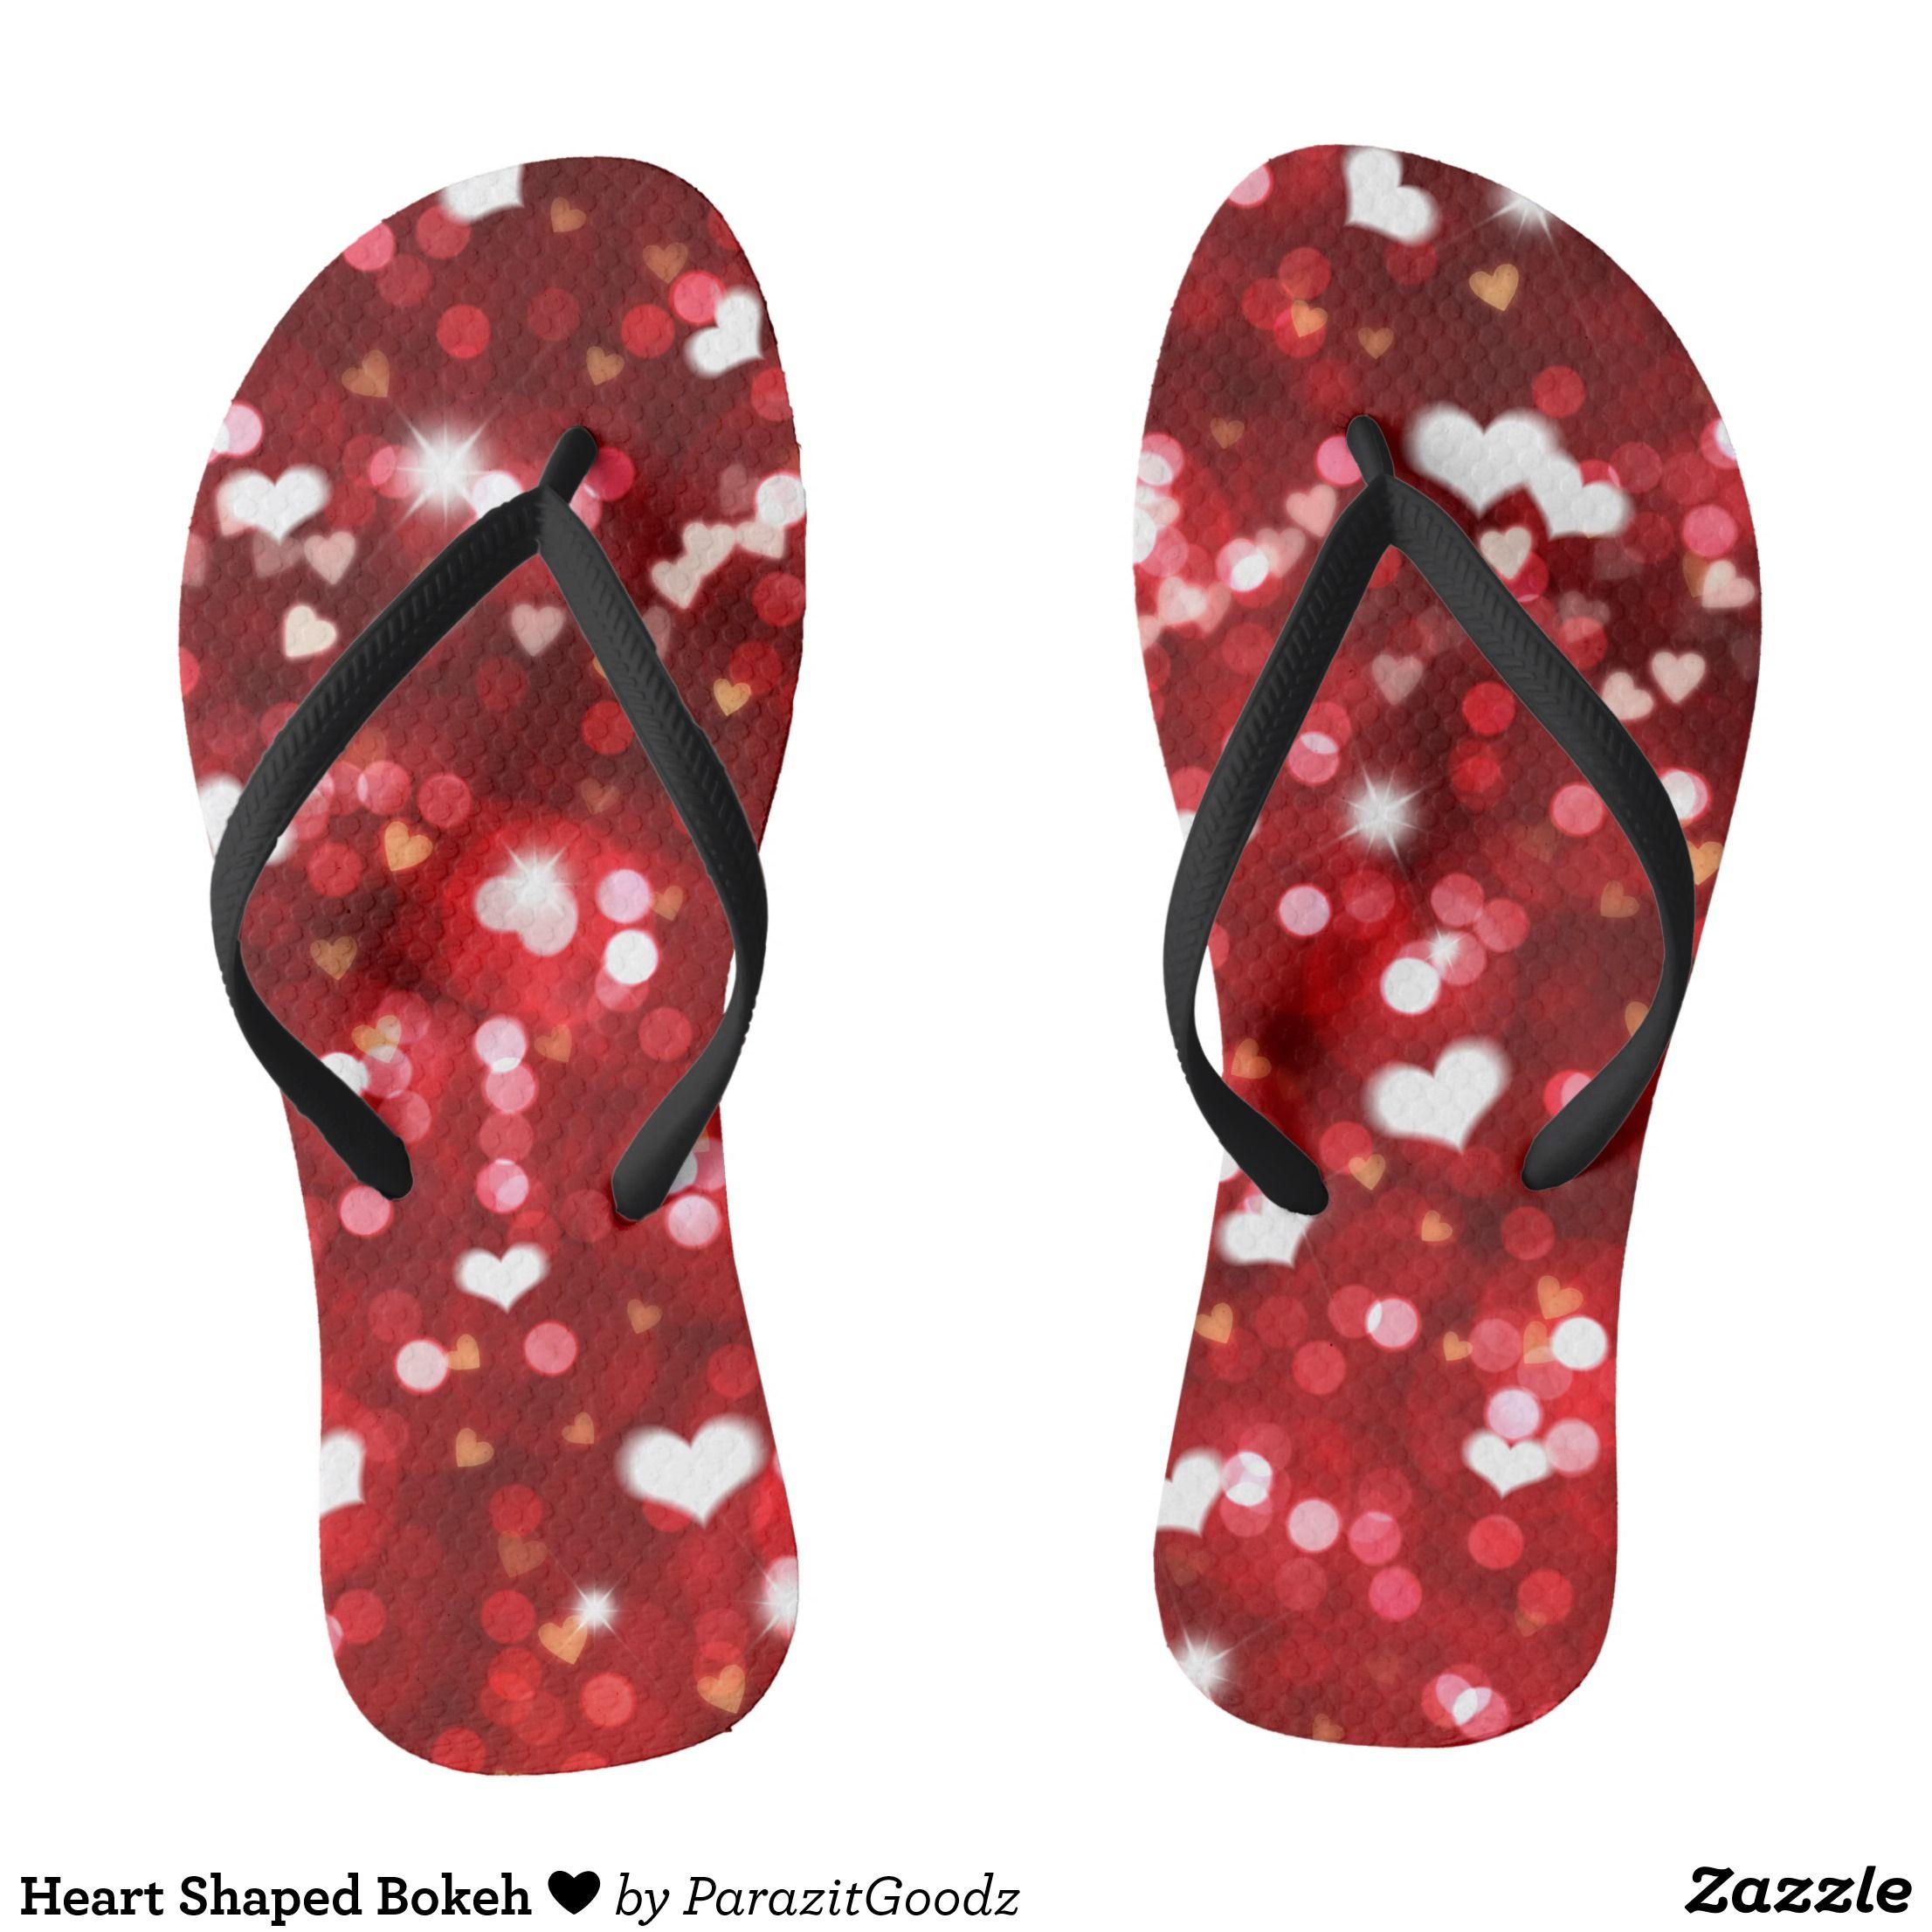 bc61a73f6620 Heart Shaped Bokeh Flip Flops - Durable Thong Style Hawaiian Beach Sandals  By Talented Fashion   Graphic Designers -  sandals  flipflops  hawaii   beach ...